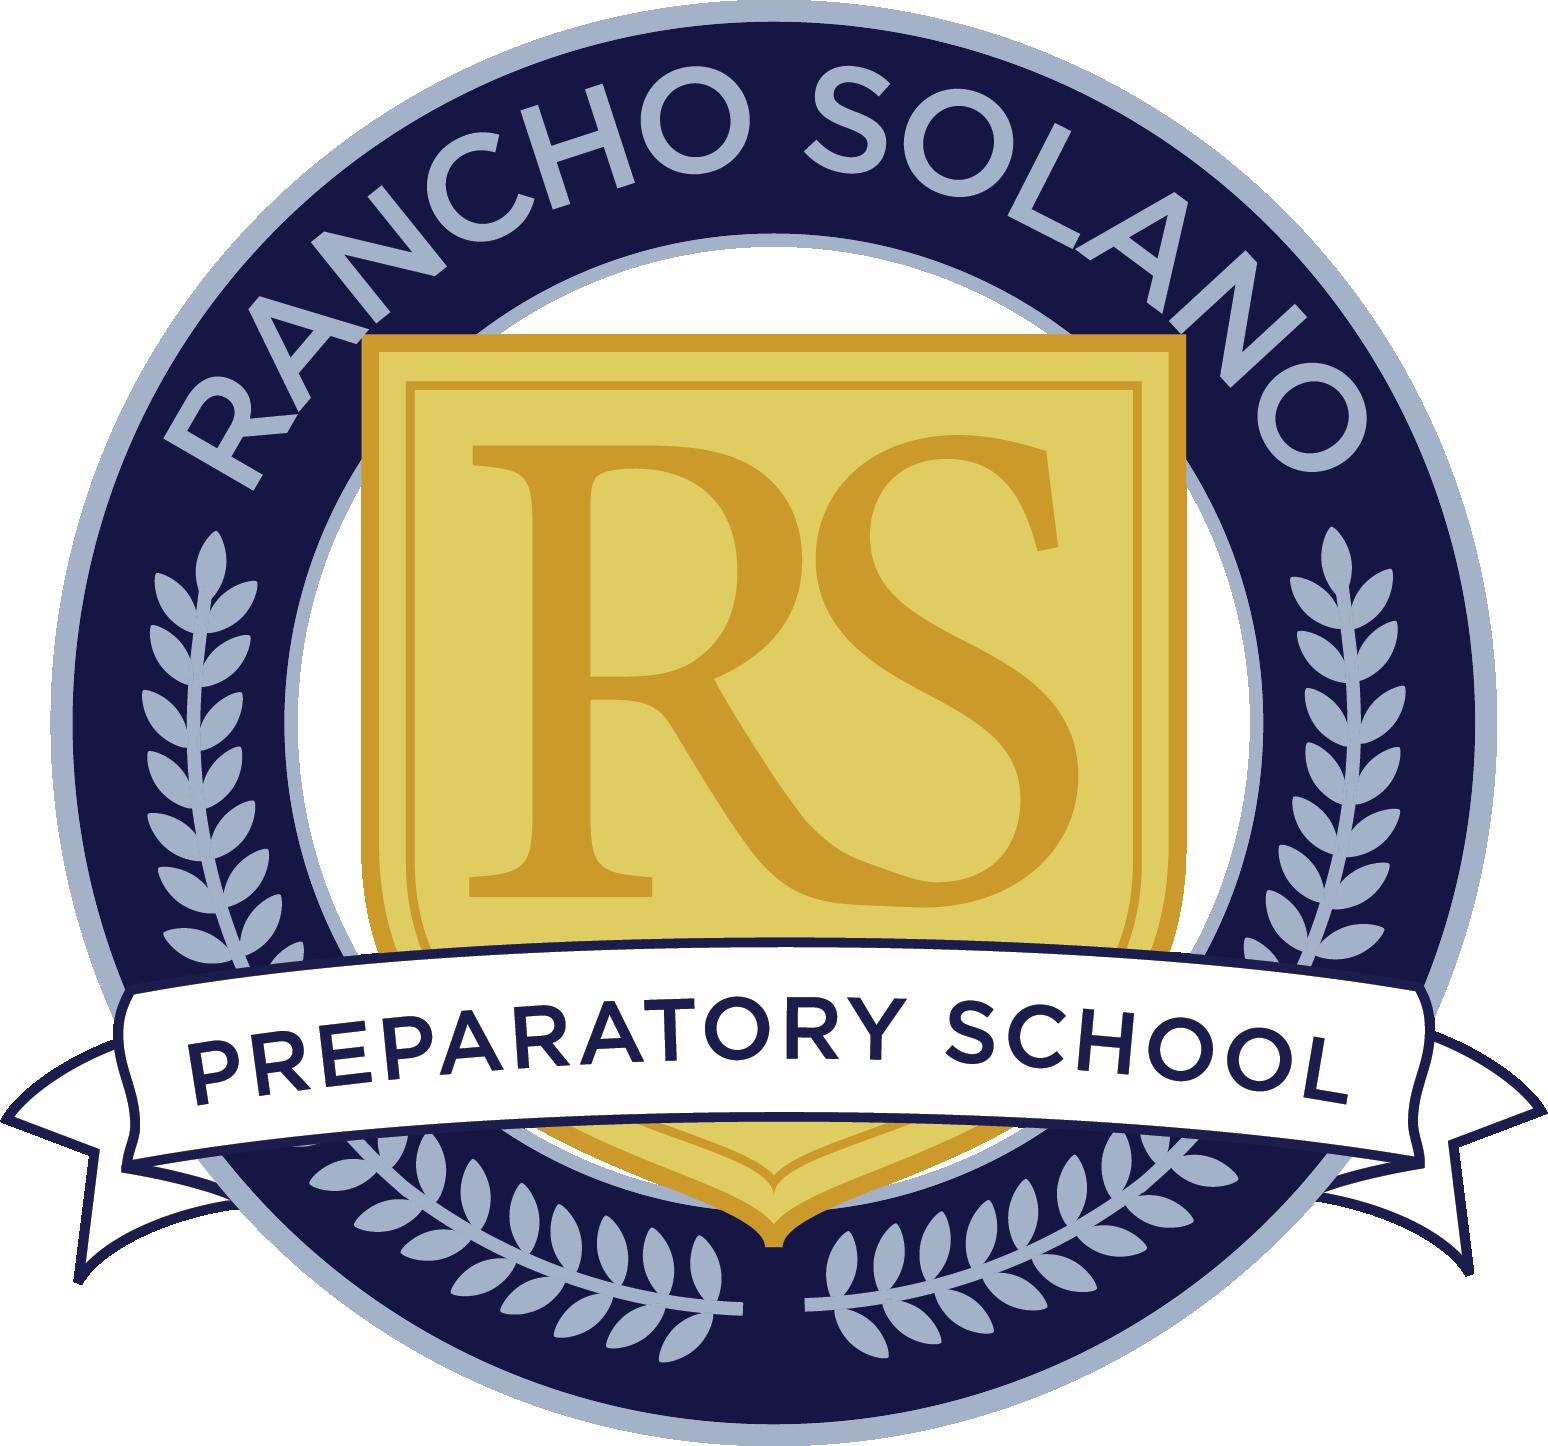 Arizona - Trường Trung Học Rancho Solano Preparatory School - USA